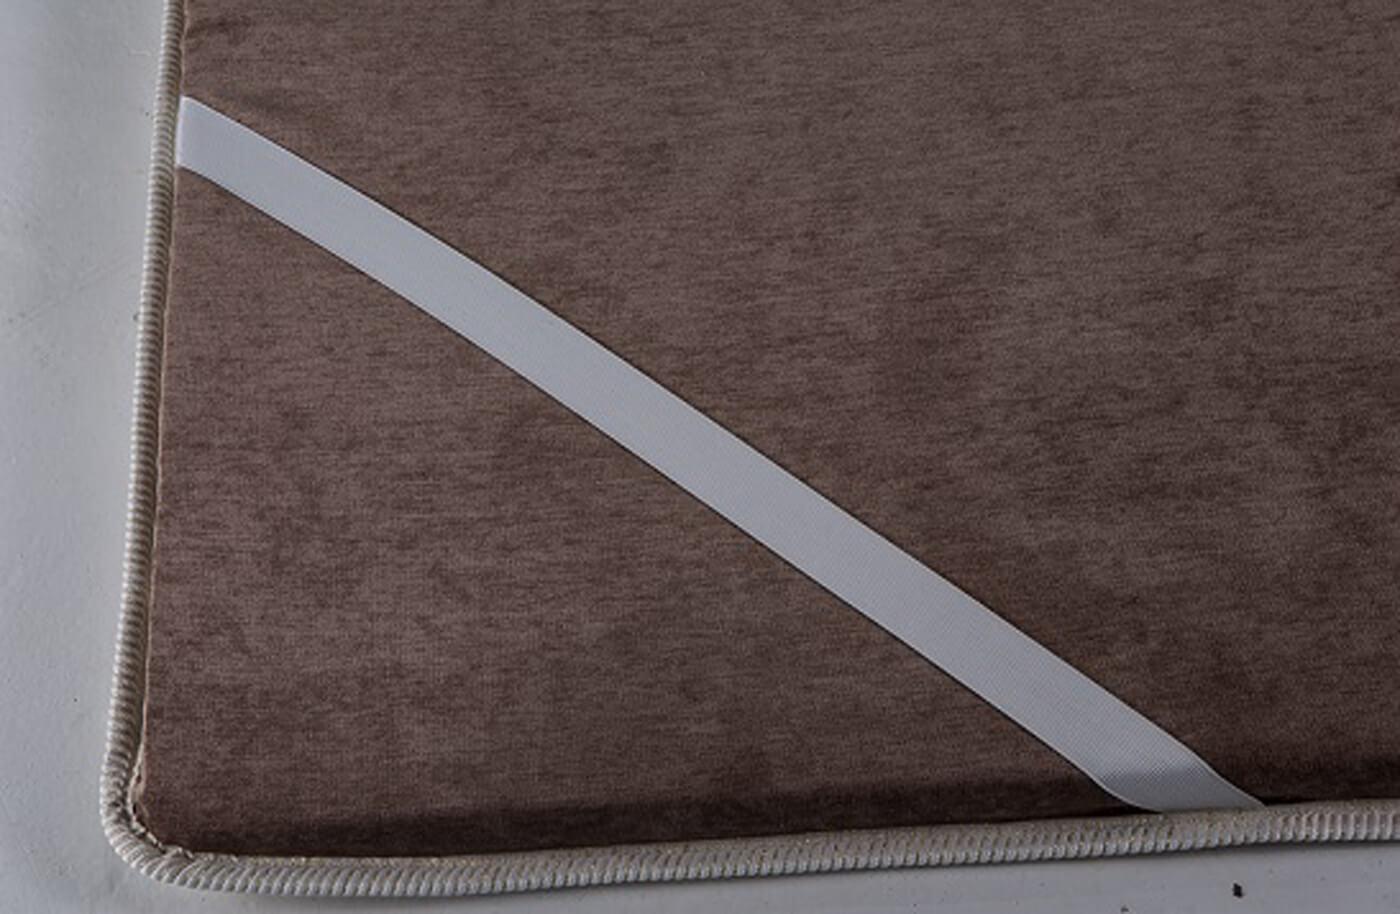 Manta Magnética Colchonete King Size 1,93x2,03x05cm Kenko Premium  - Kenko Premium Colchões